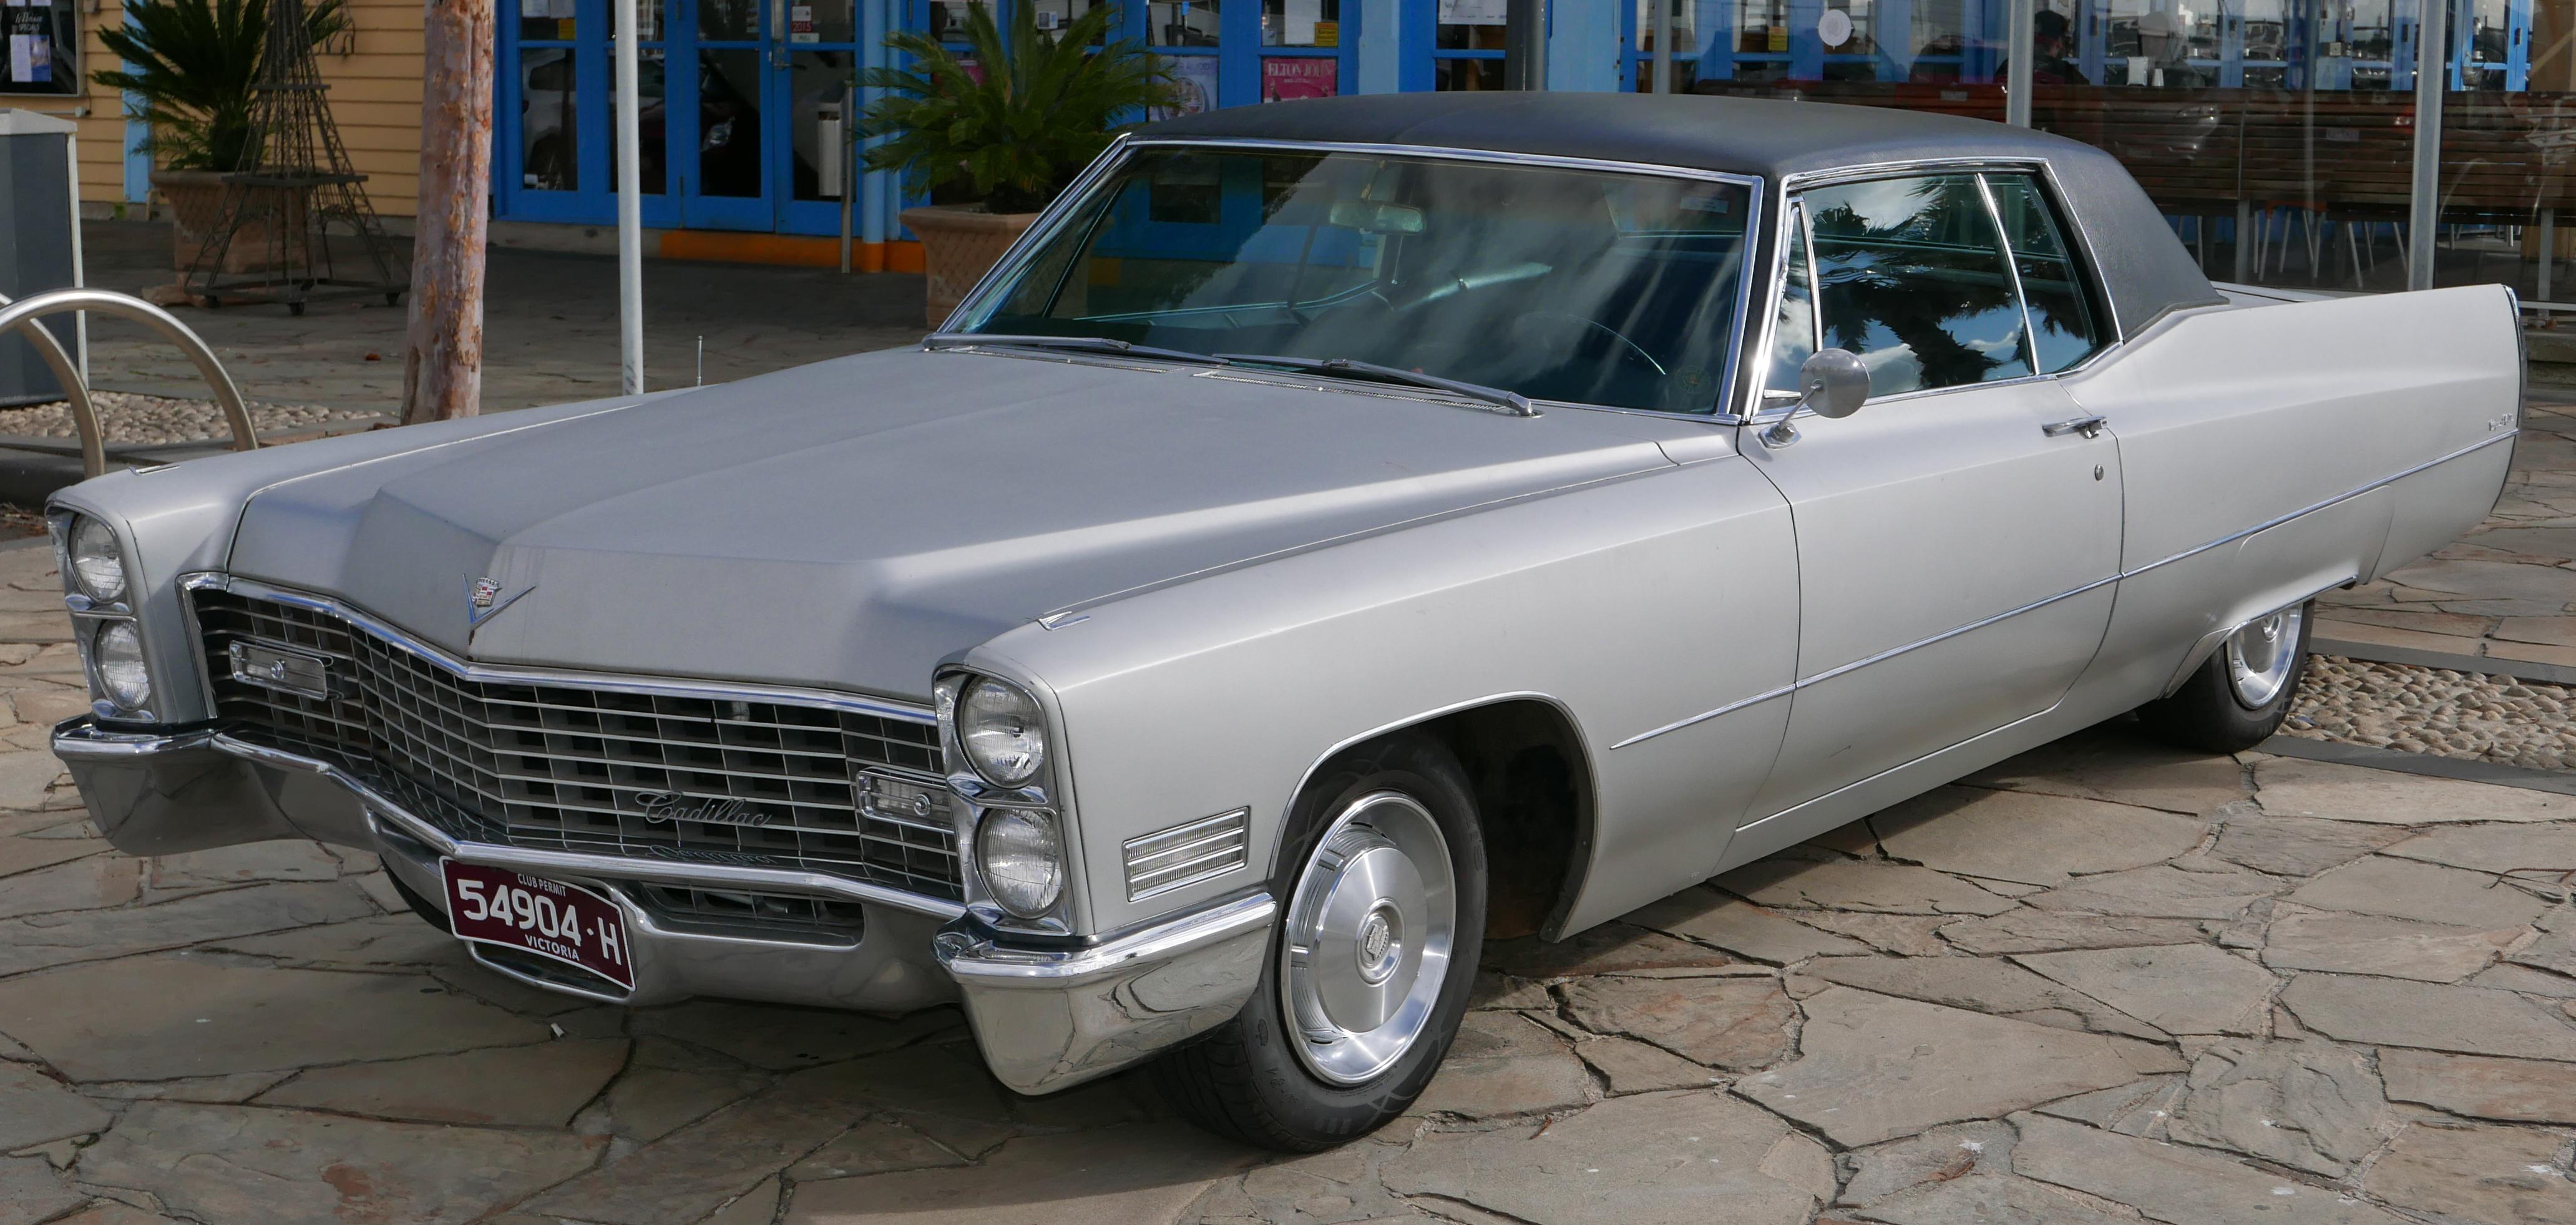 Cadillac Convertible 2015 >> File:1967 Cadillac Coupe de Ville 2-door hardtop (2015-08 ...